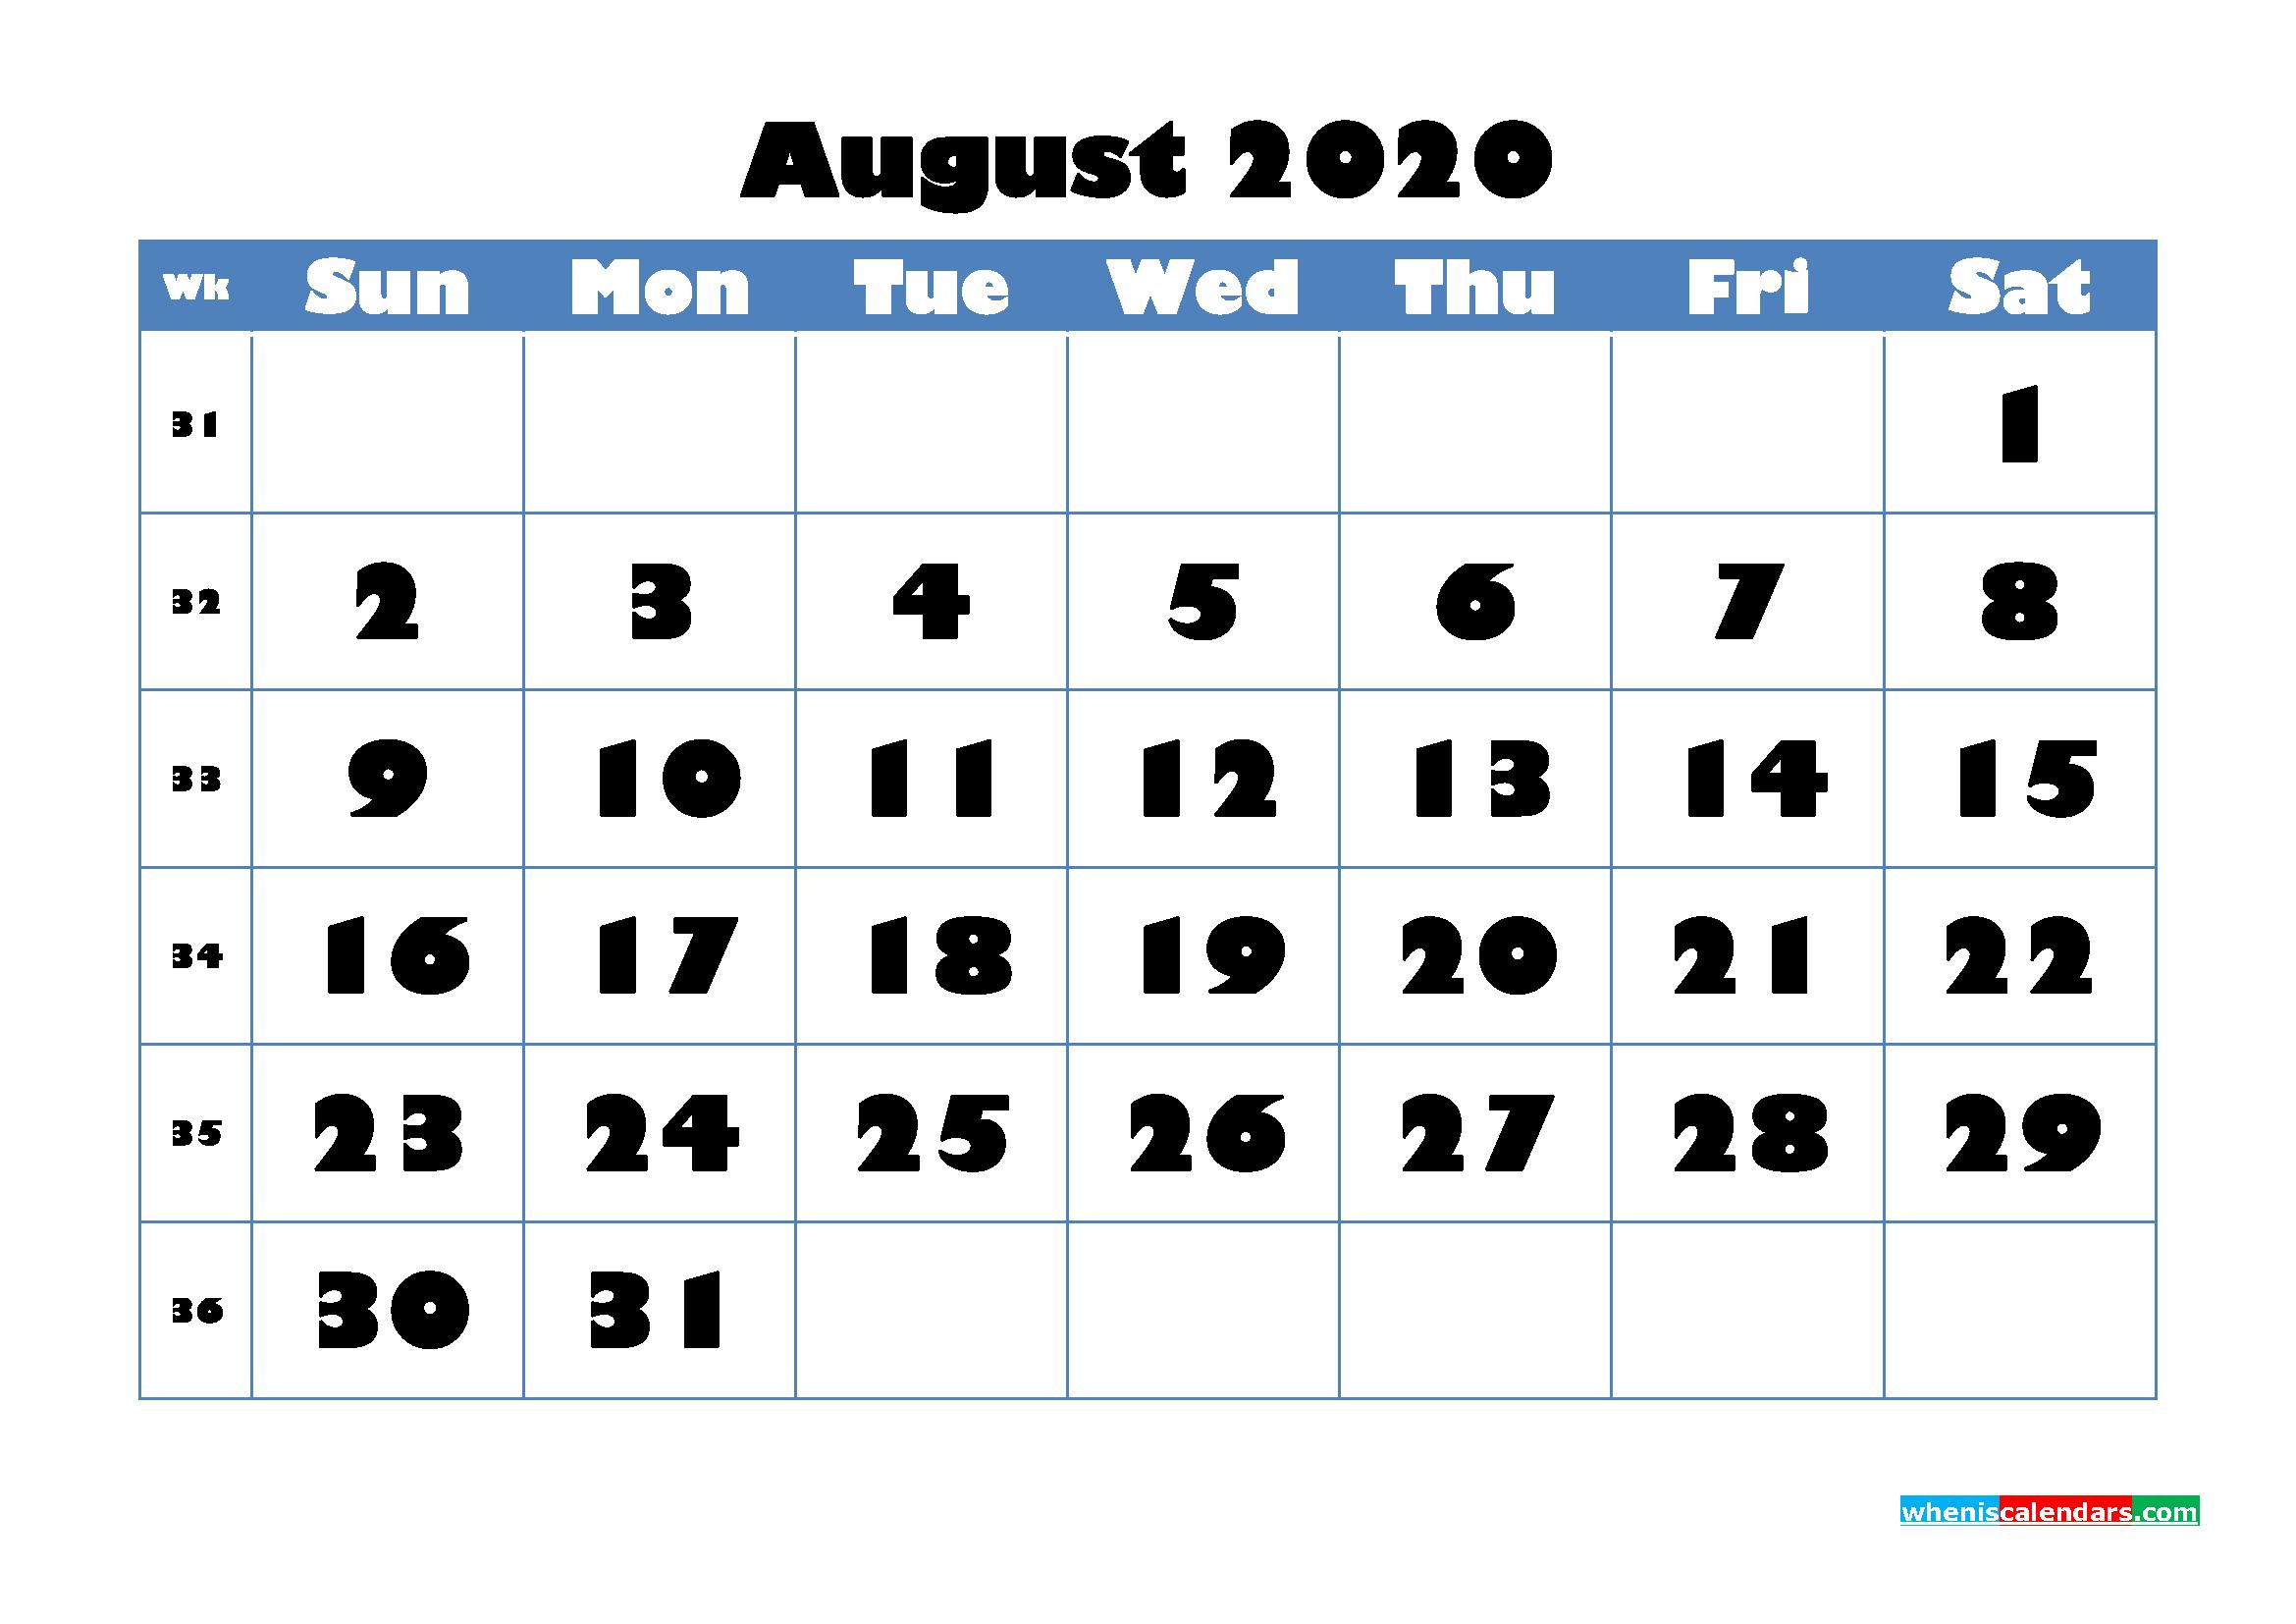 August 2020 Blank Calendar Printable - No.m20b716